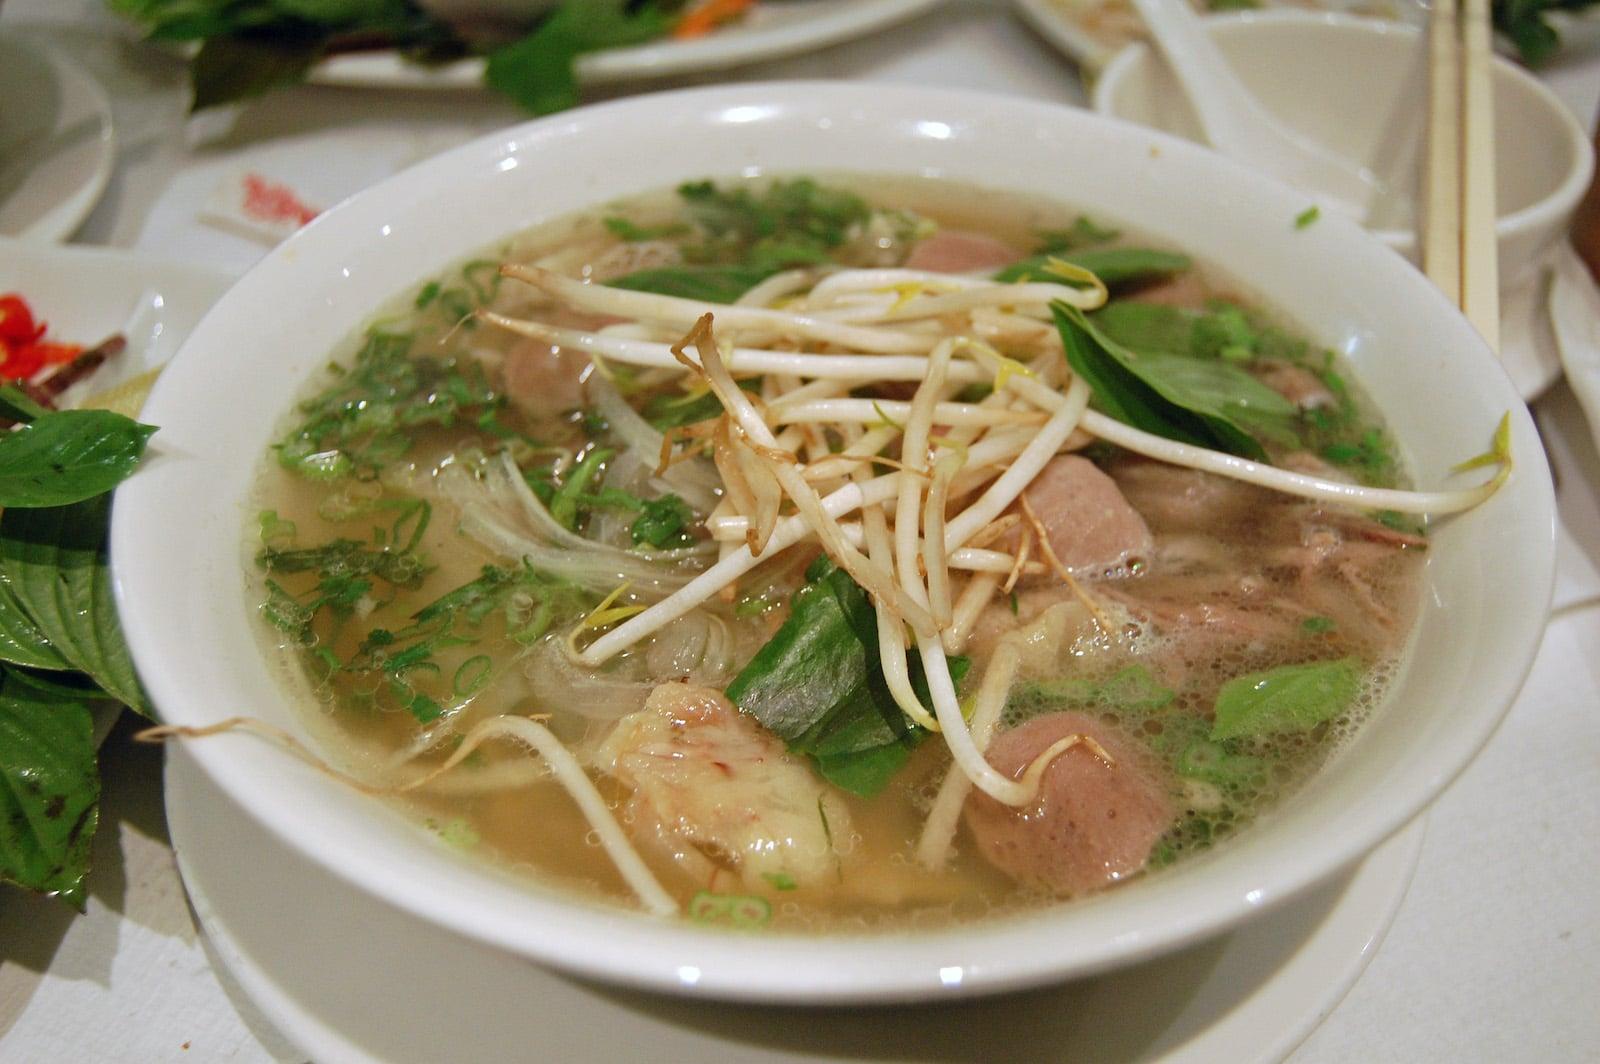 Vietnamese food pho bo soup